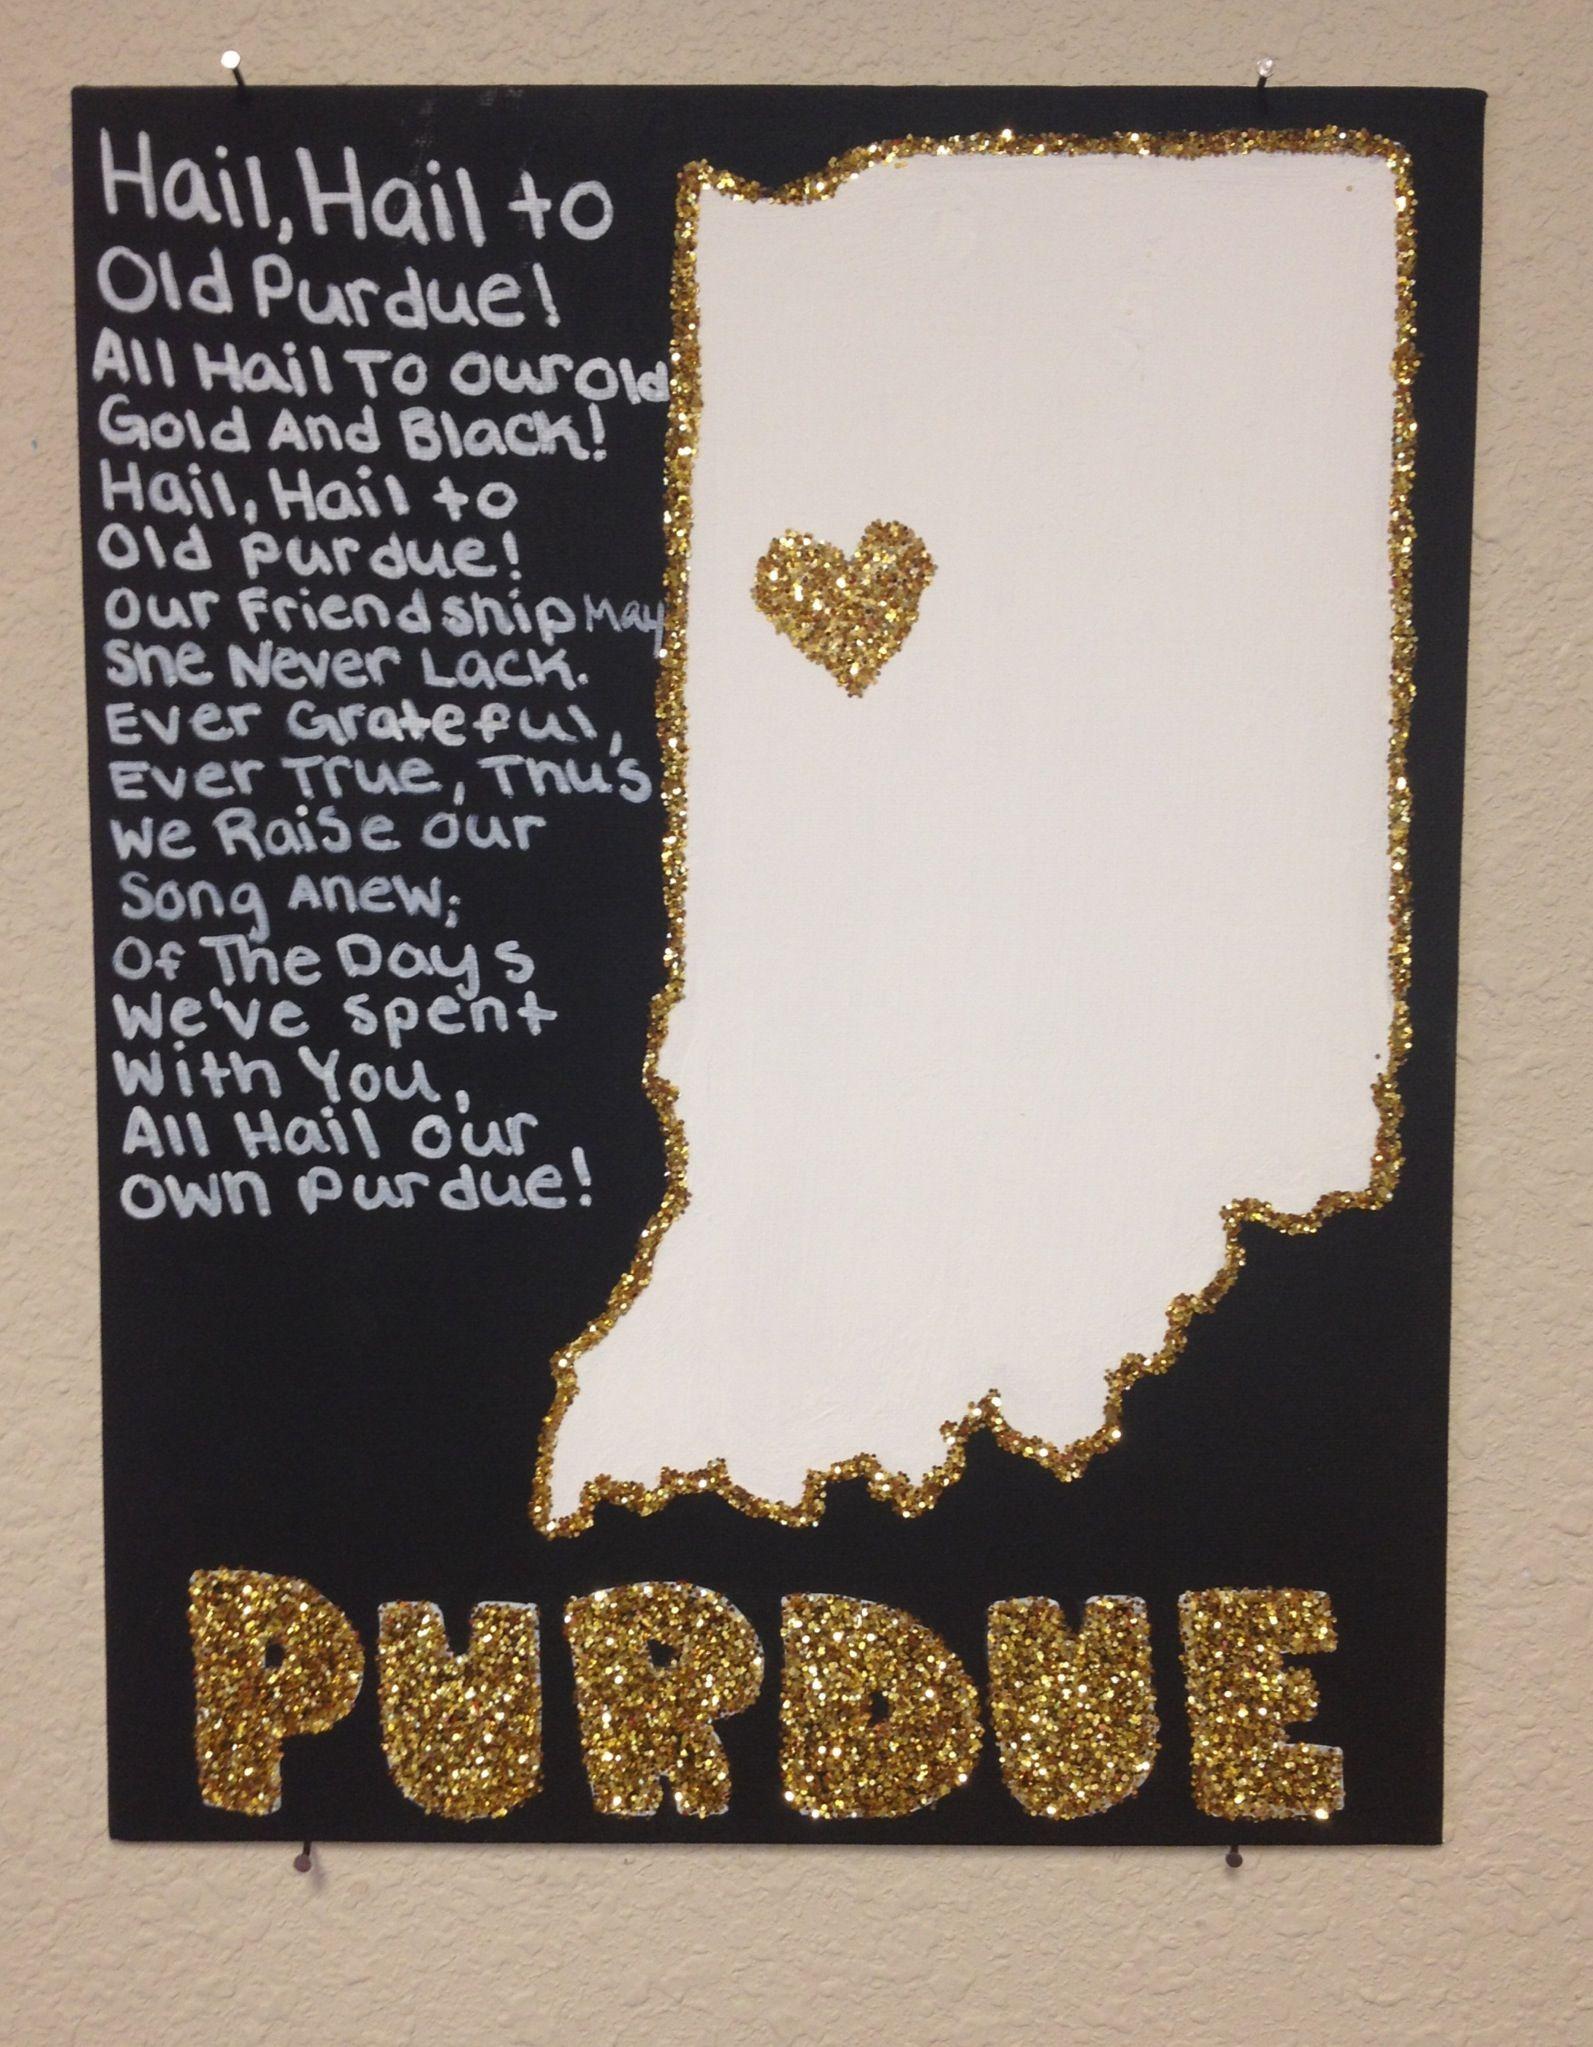 Color printing purdue - Purdue University